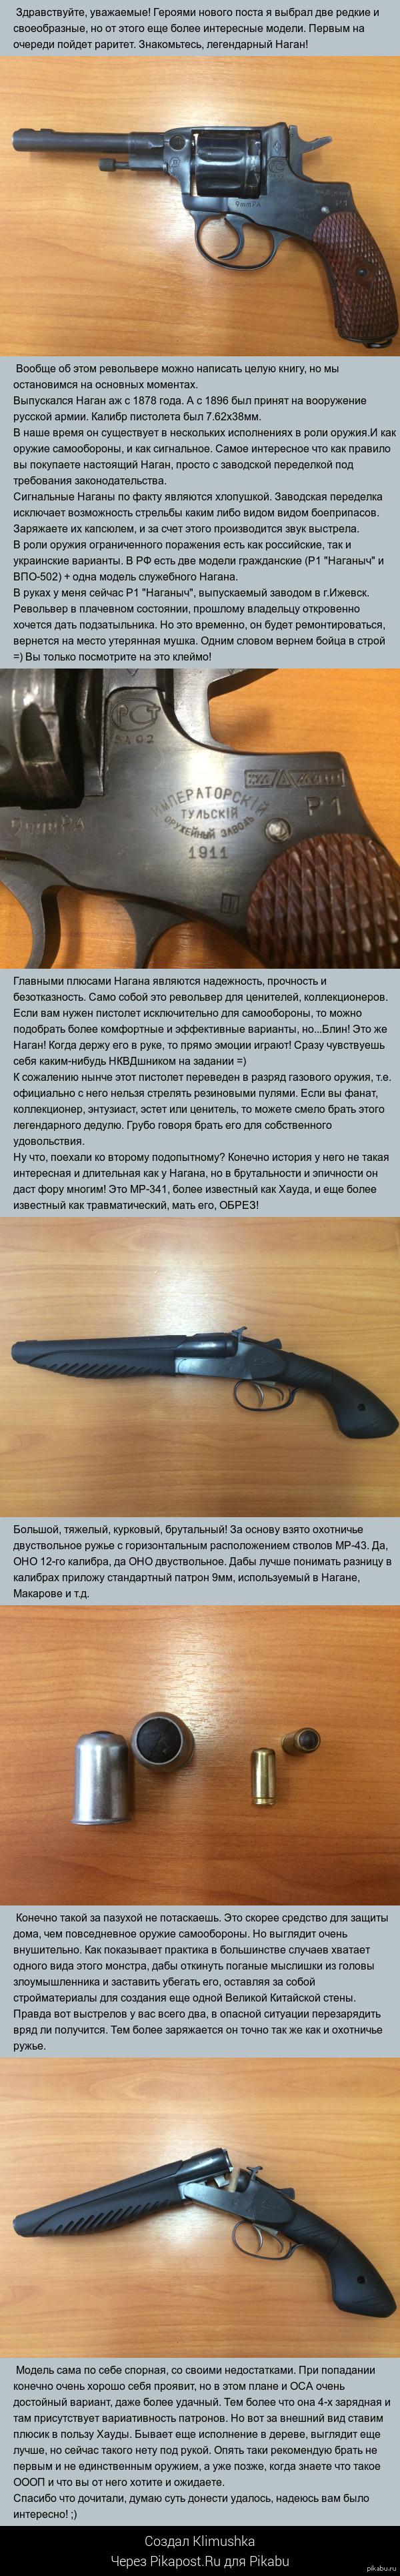 "Револьвер Наган и ""обрез"" Хауда"